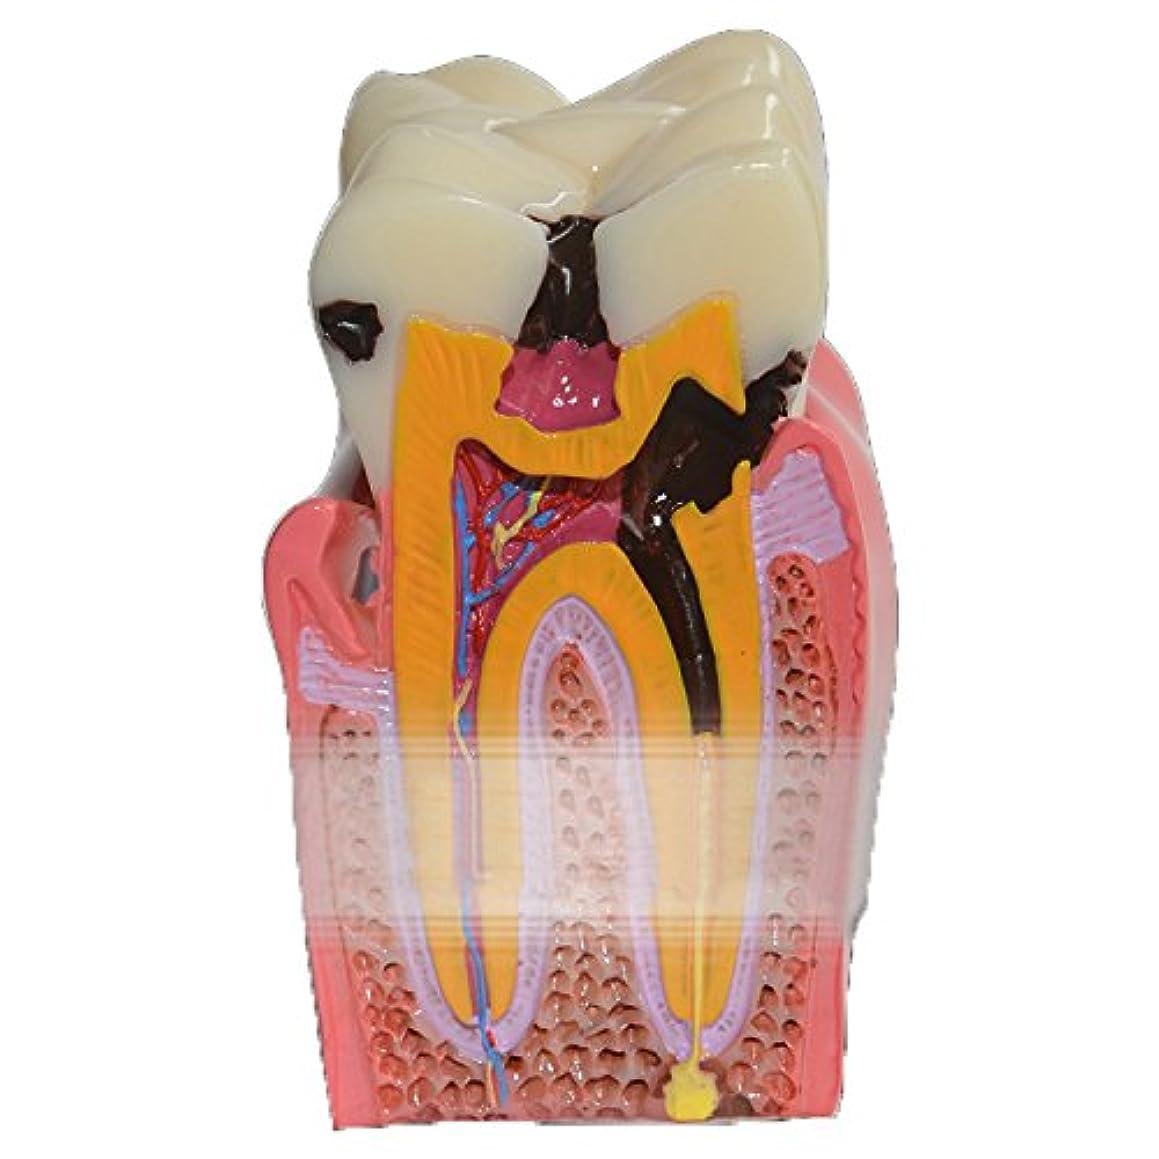 神突き出す戸棚GoDen大人と小児歯模型 解剖学的歯模型 教学用模型